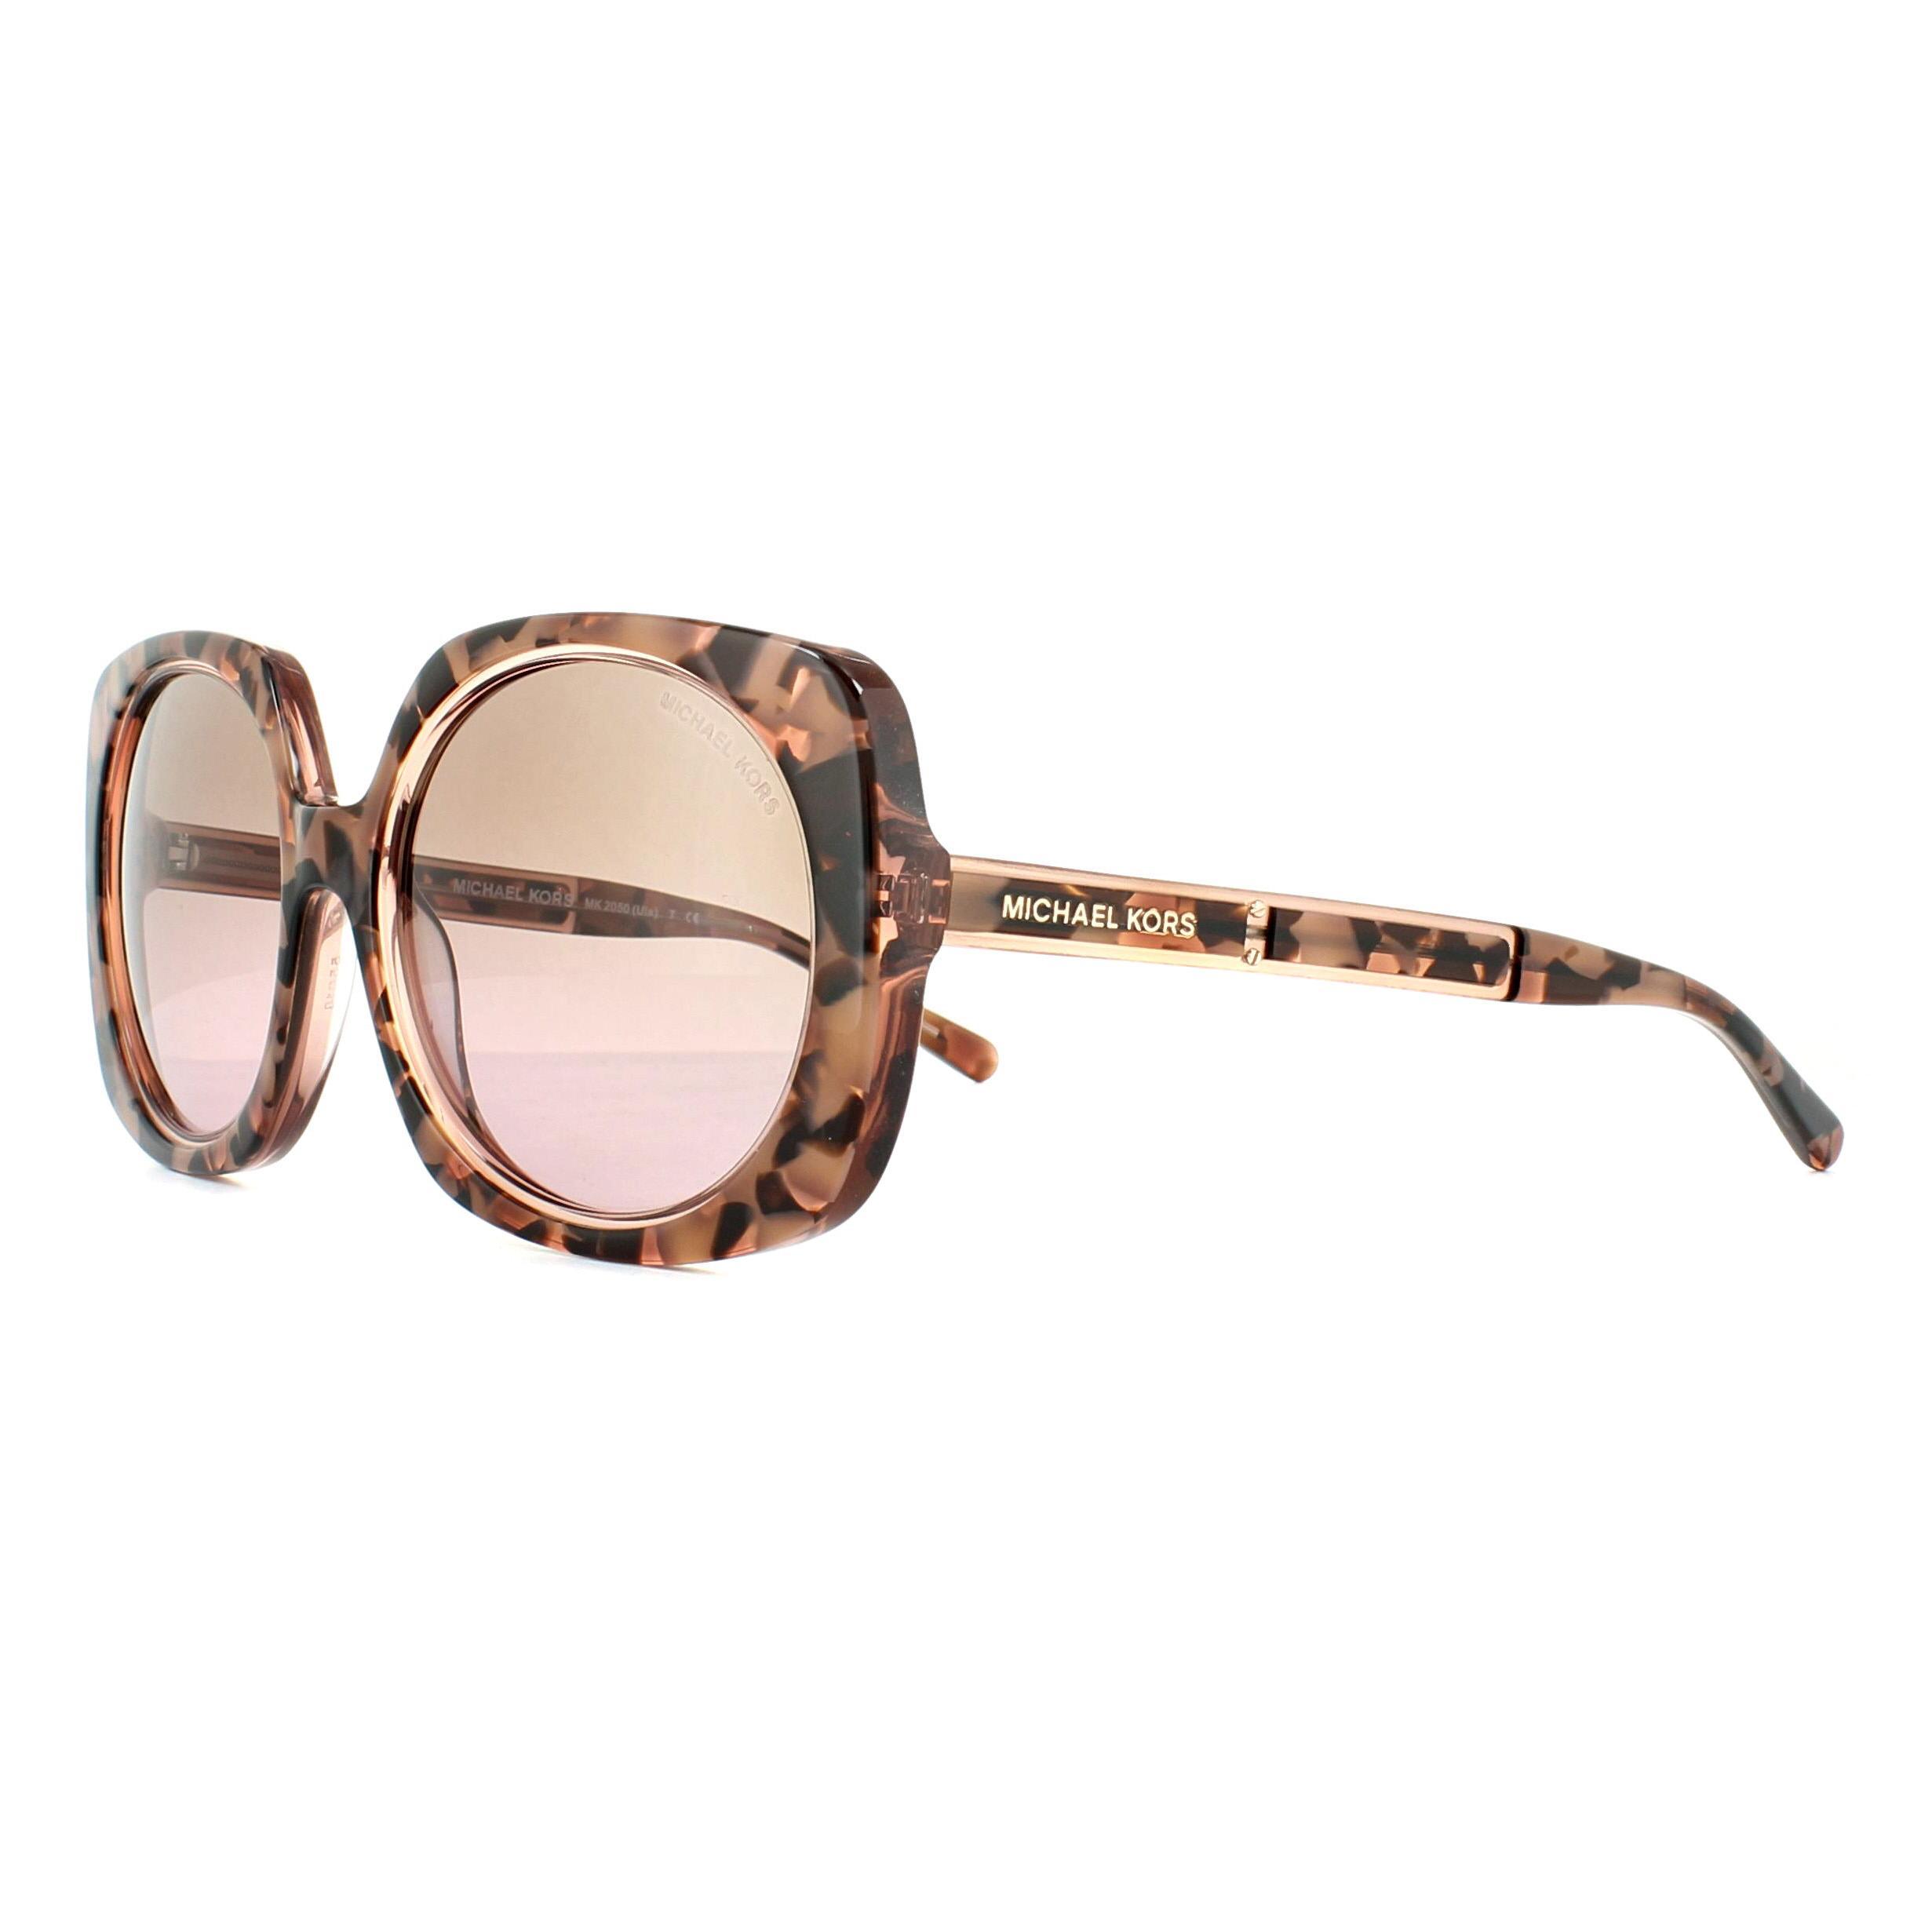 8e78e056dd Sentinel Michael Kors Sunglasses Ula 2050 325114 Pink Tortoise Graphic  Brown Rose Shaded